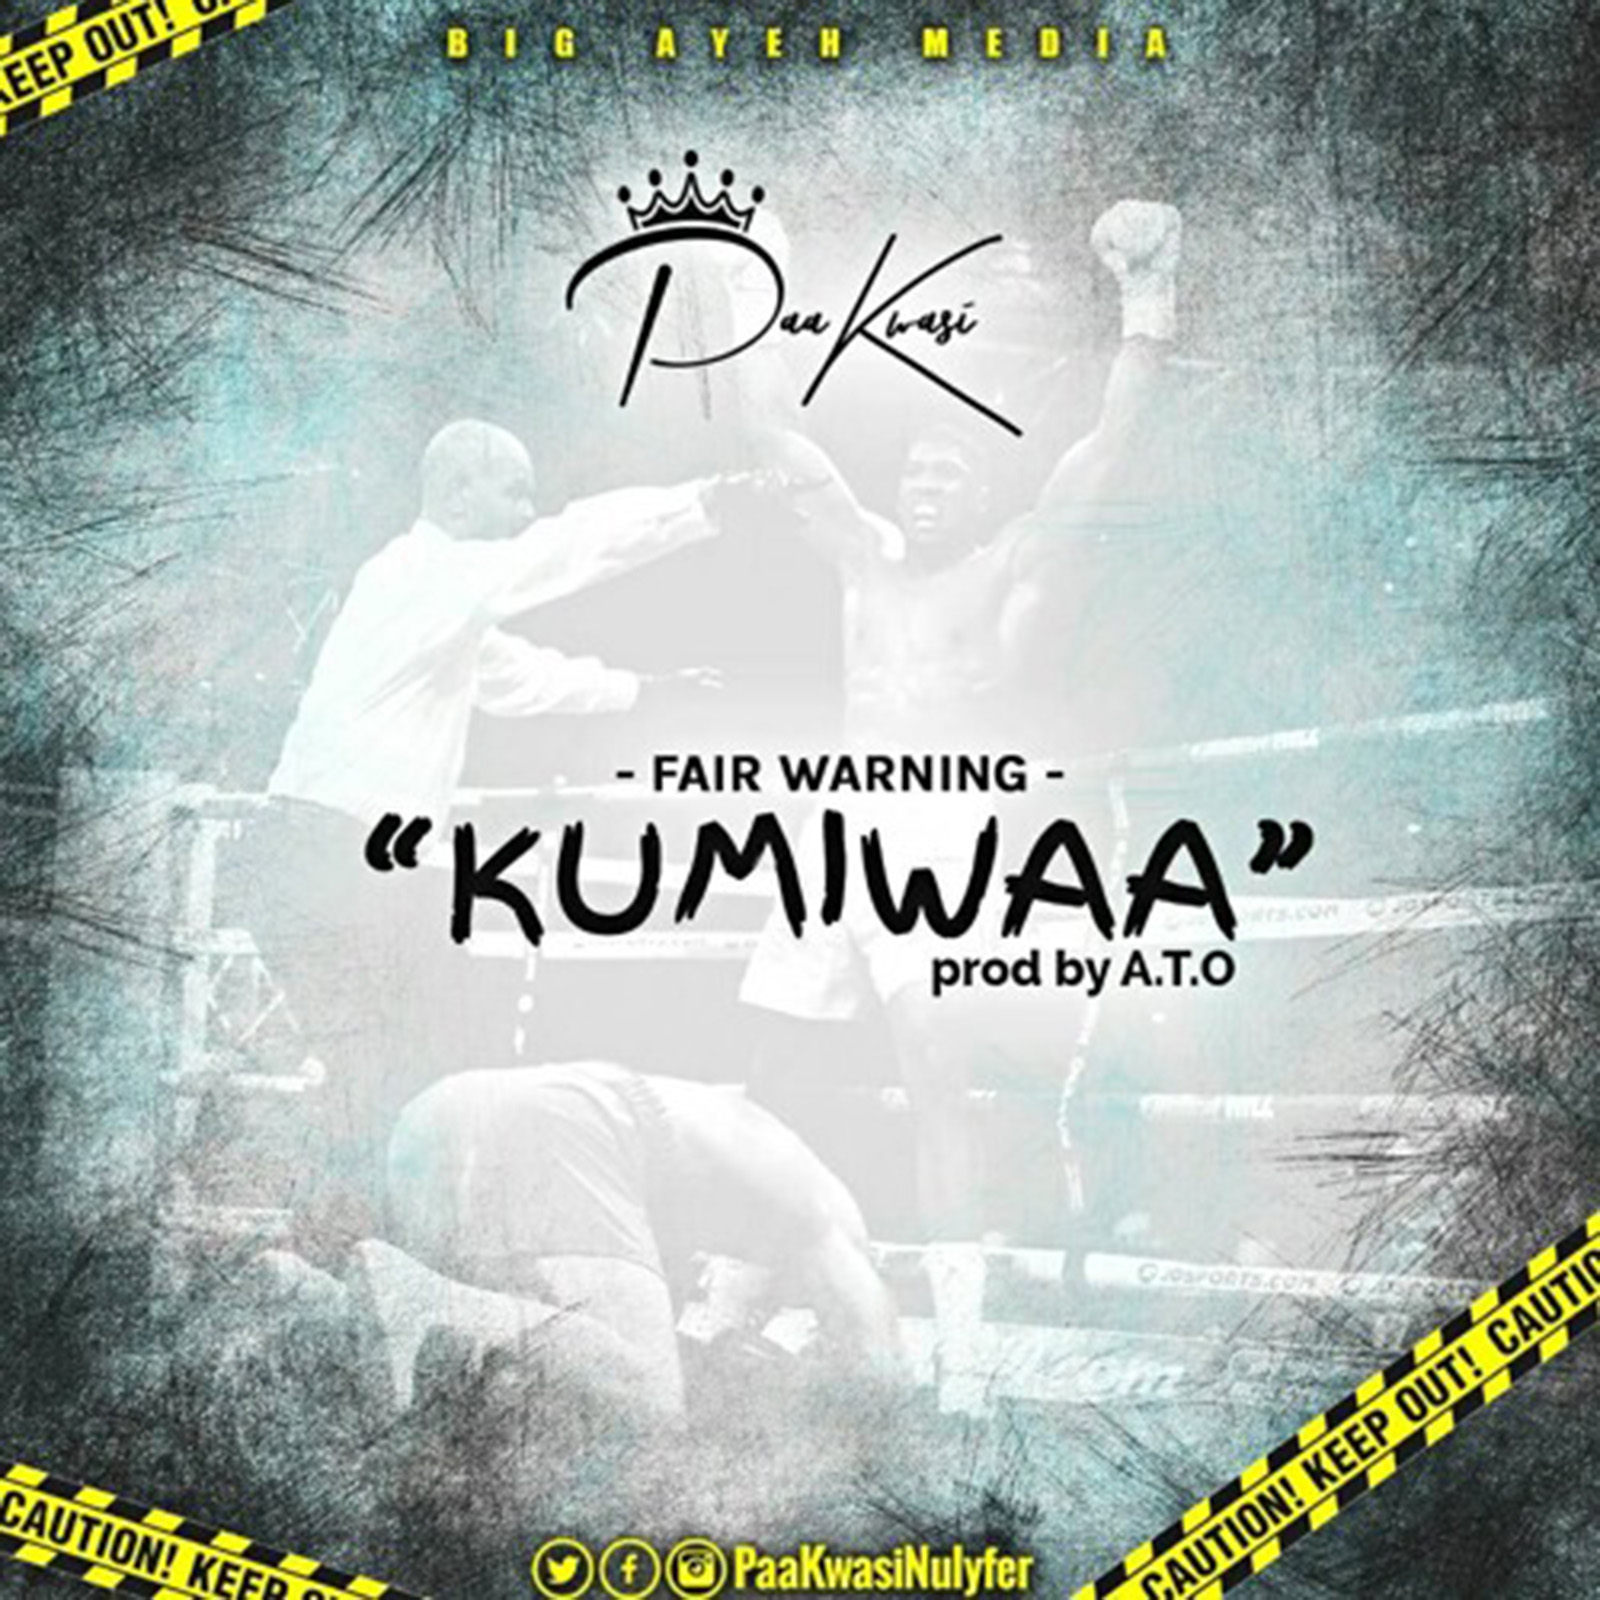 Kumiwaa (Kumi Guitar Diss) by Paa Kwasi